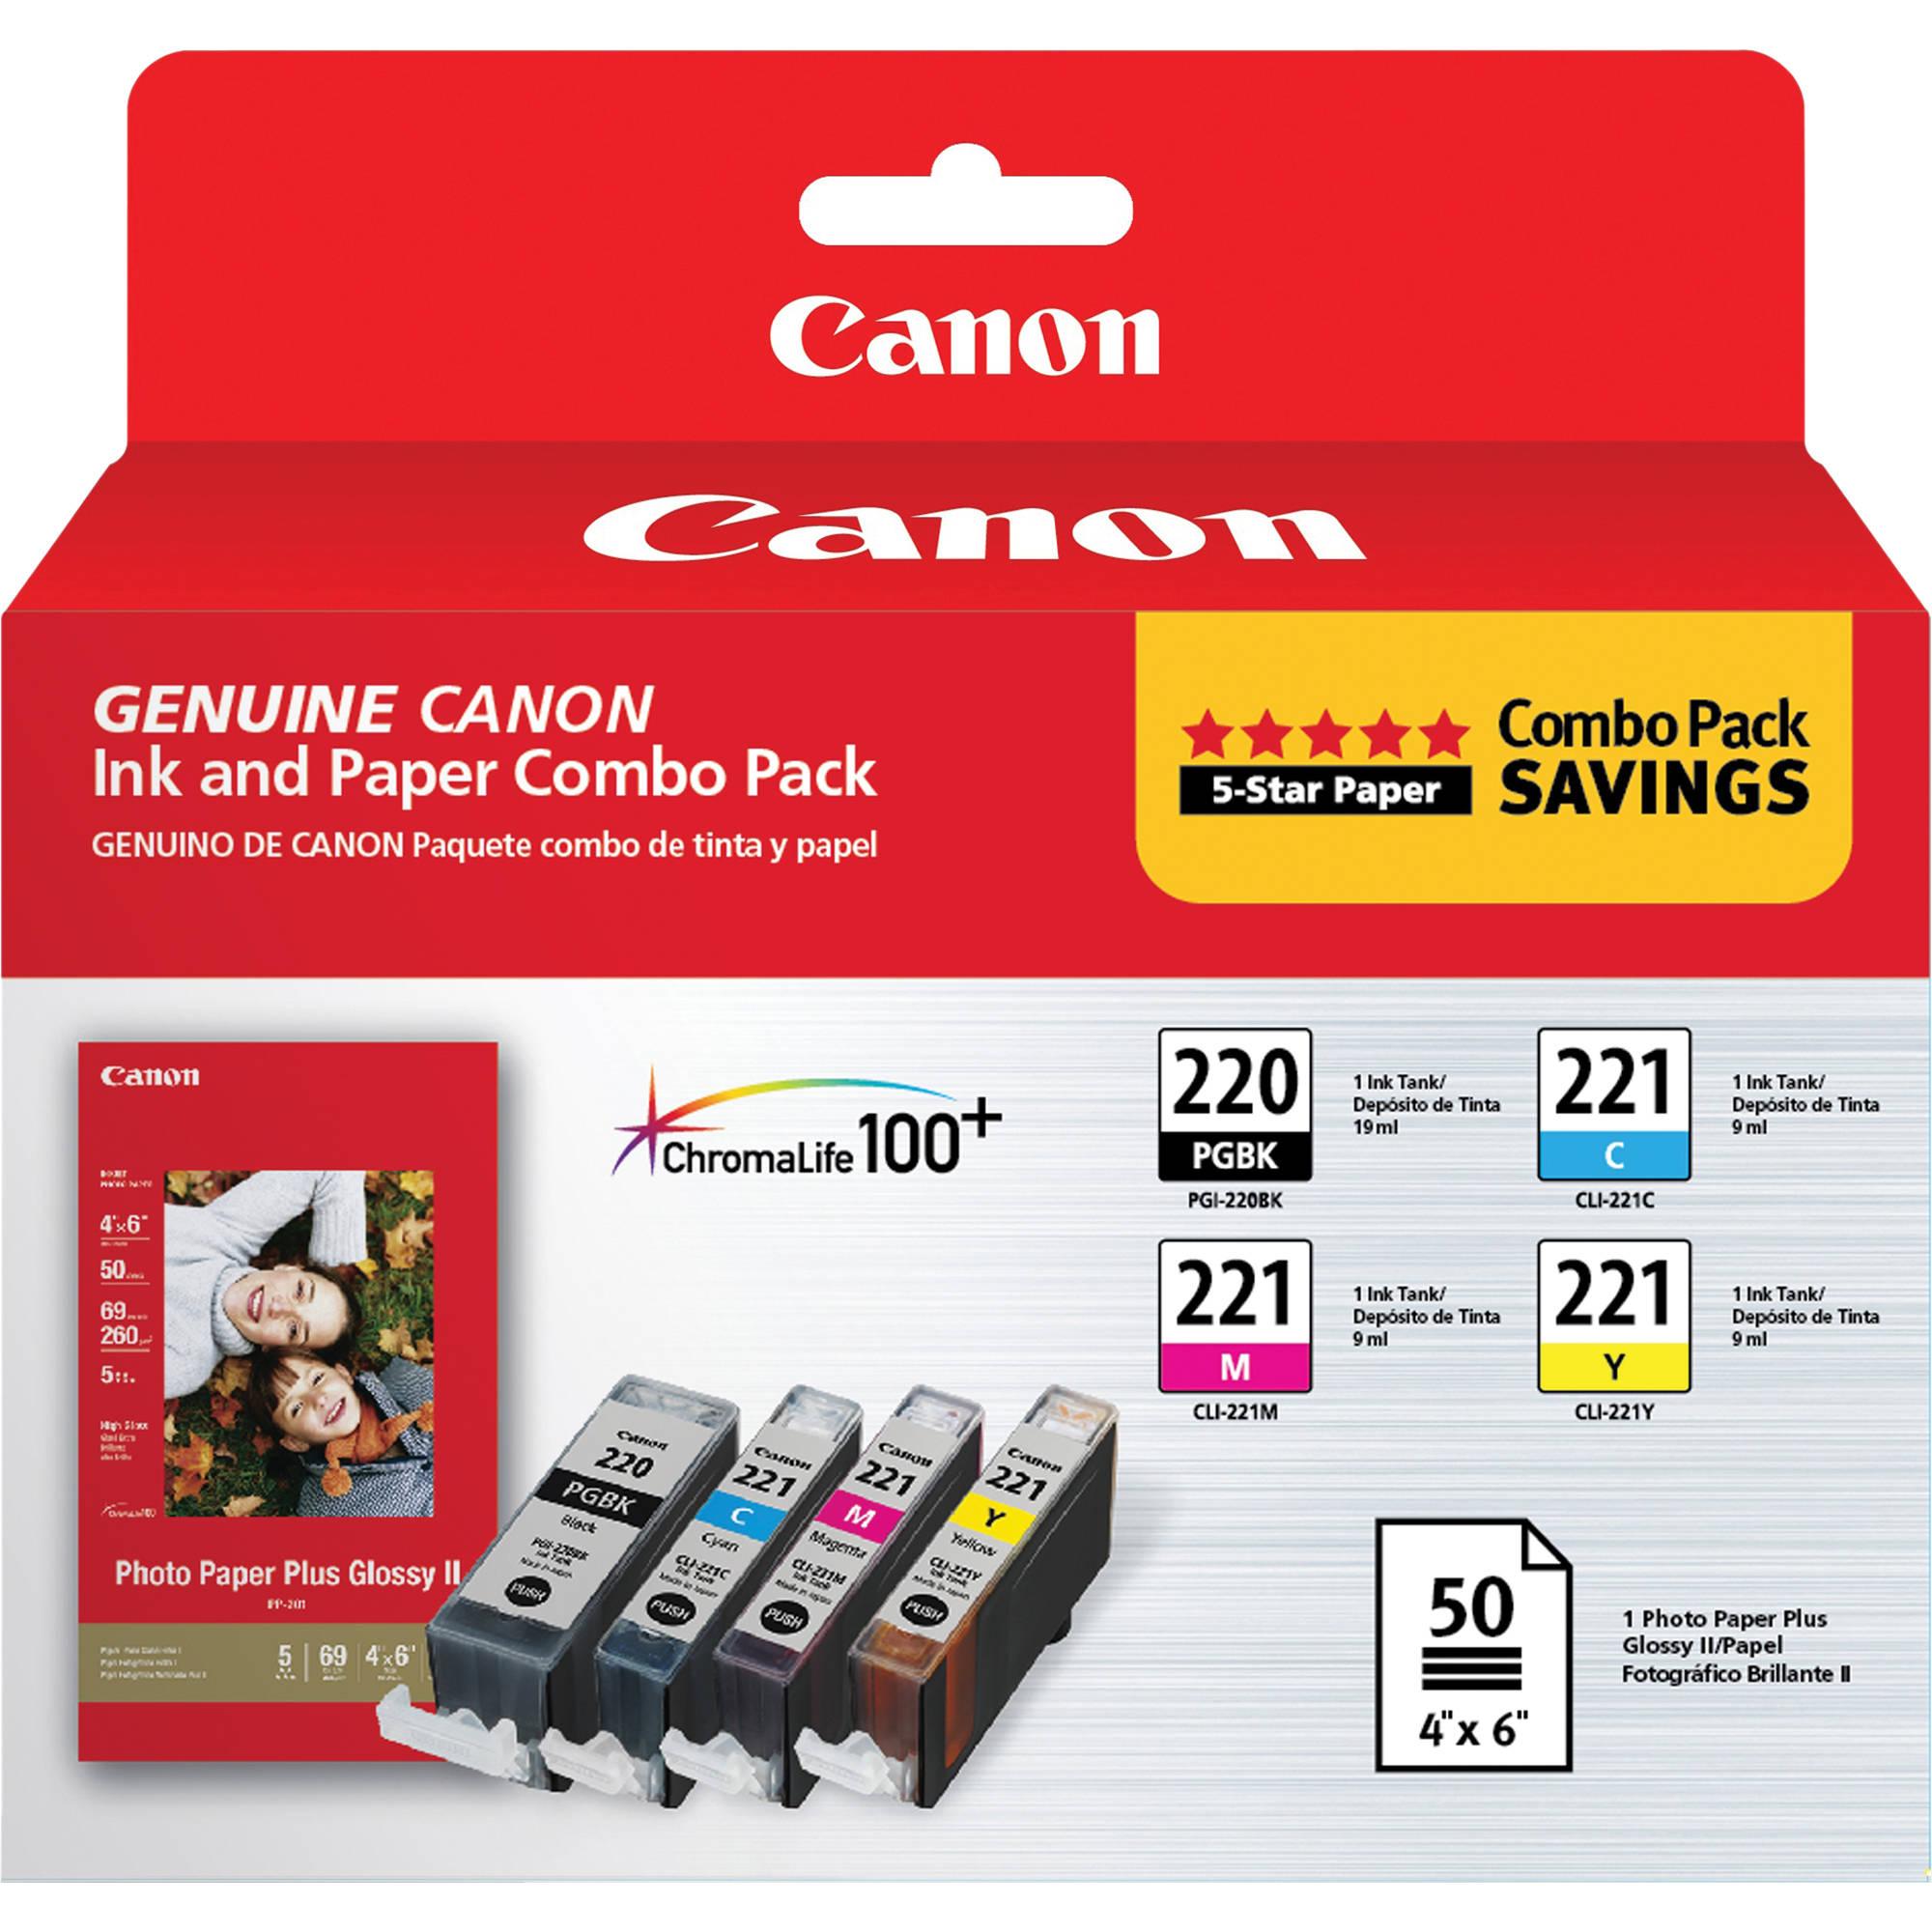 1 Pack NEW BLACK Ink Cartridge for Canon PGI-220 MP640 MX860 MX870 MP980 MP990